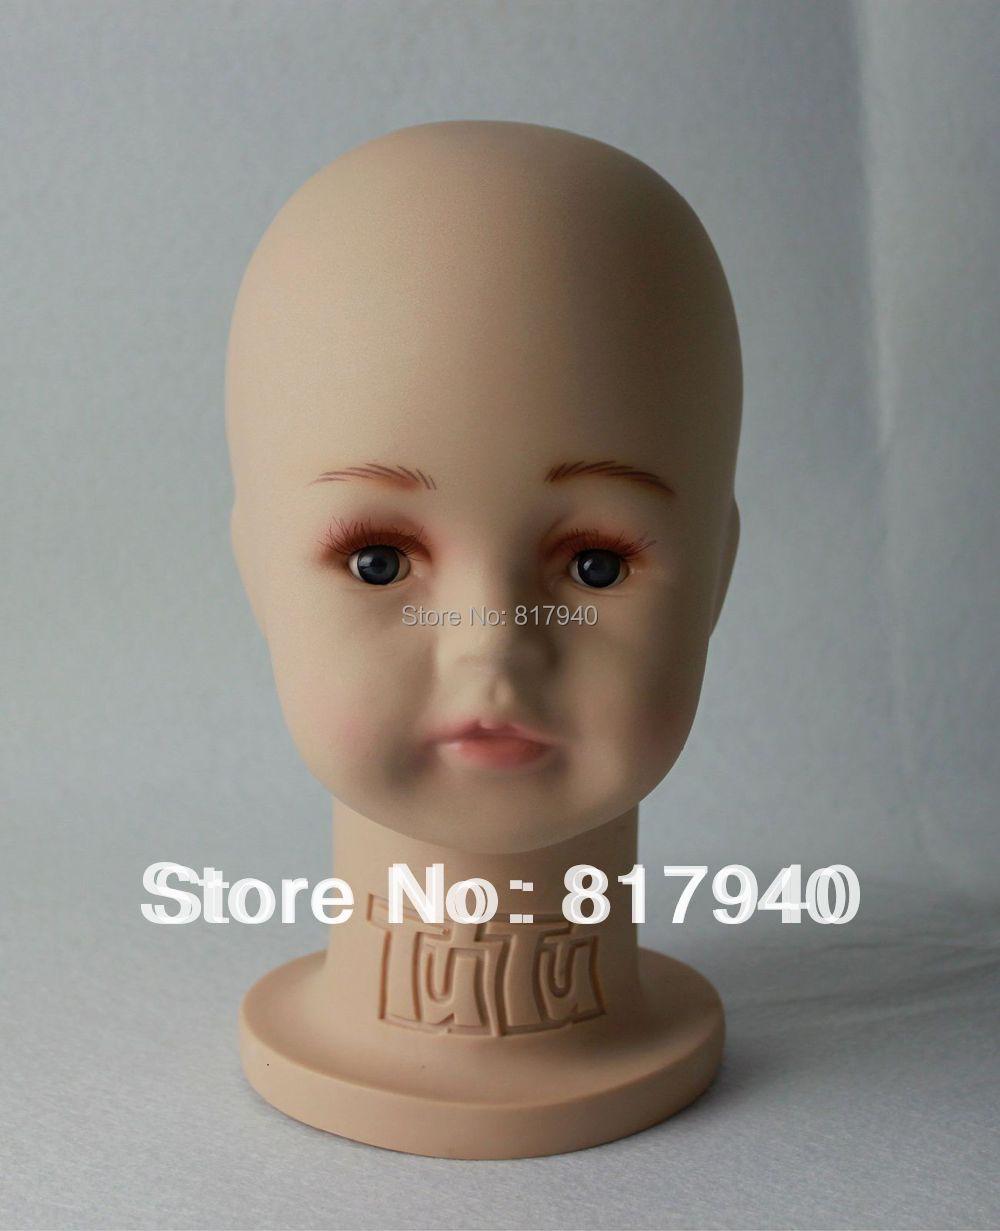 Amazing Kids Mannequin Head Reviews Online Shopping Kids Mannequin Head Hairstyles For Men Maxibearus